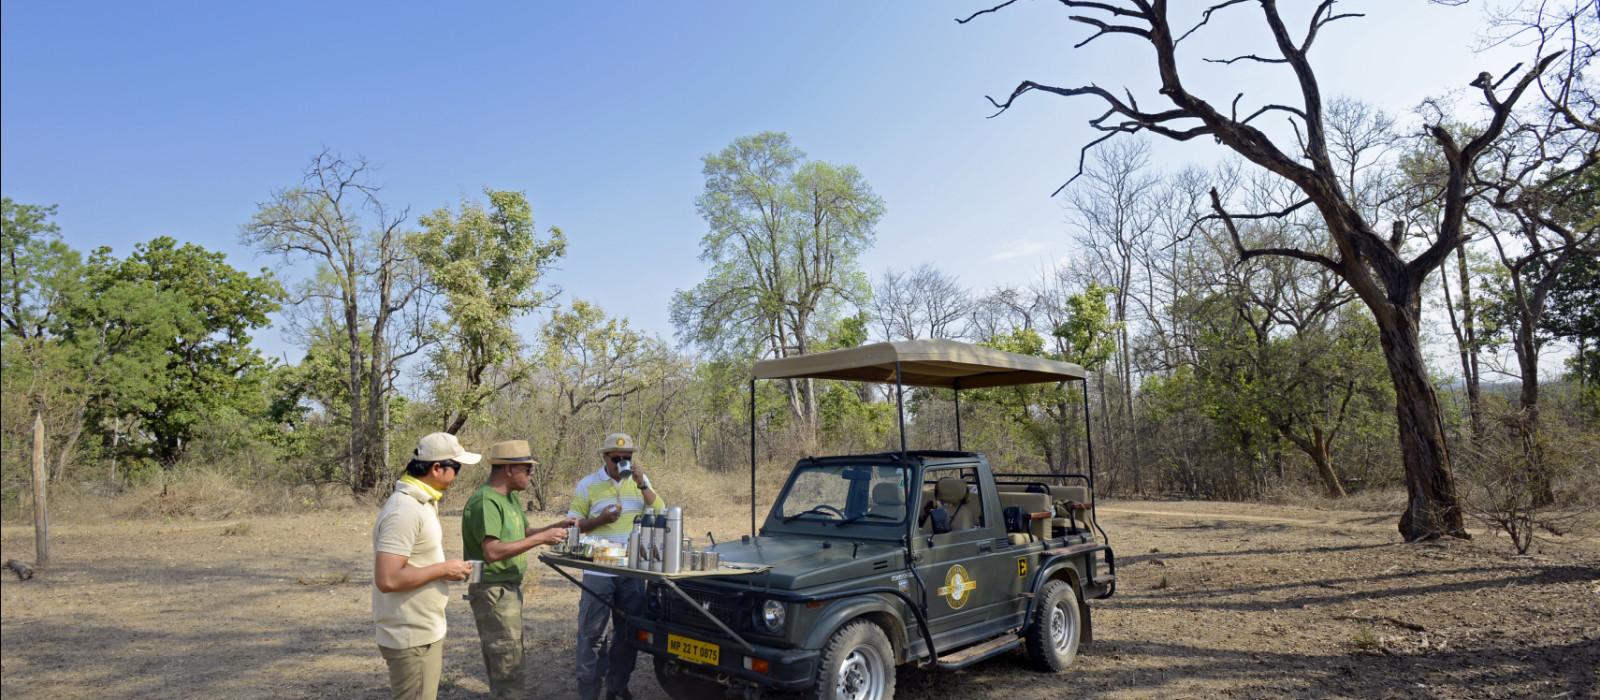 Wildlife Safari in Central India Tour Trip 1